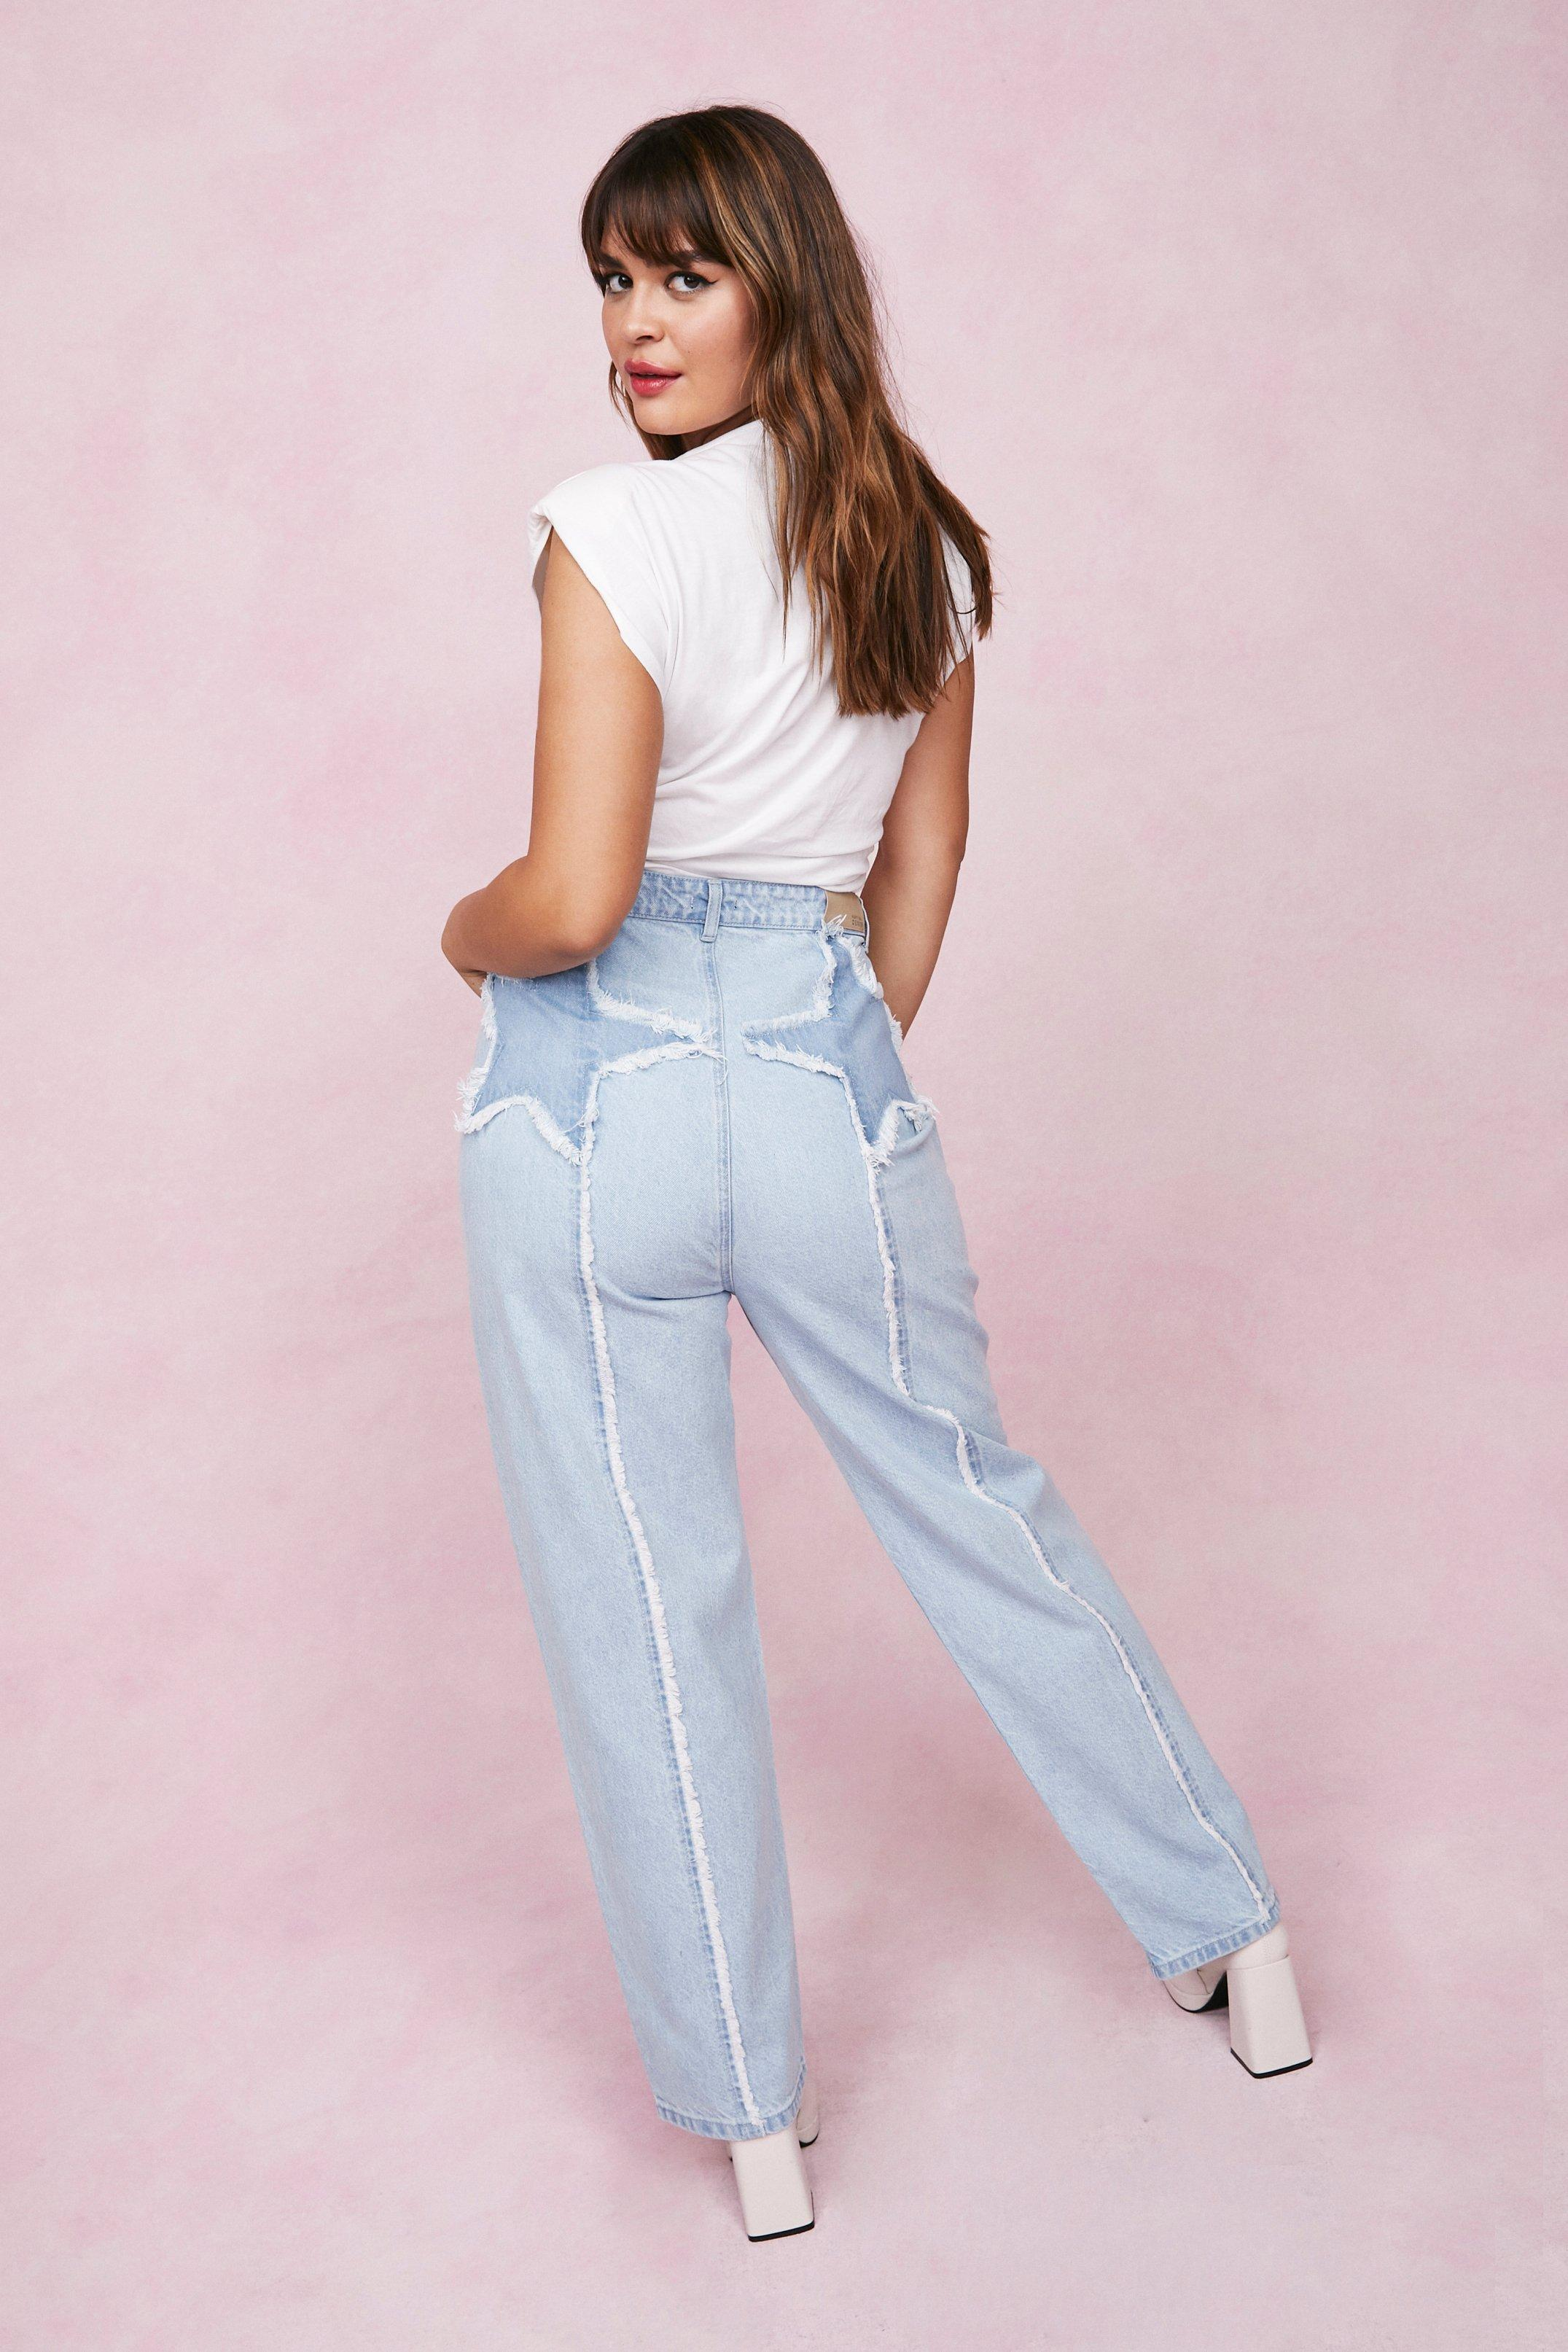 80s Jeans, Pants, Leggings | 90s Jeans Womens Plus Size Star Design High Waisted Jeans - Blue - 16 $71.00 AT vintagedancer.com